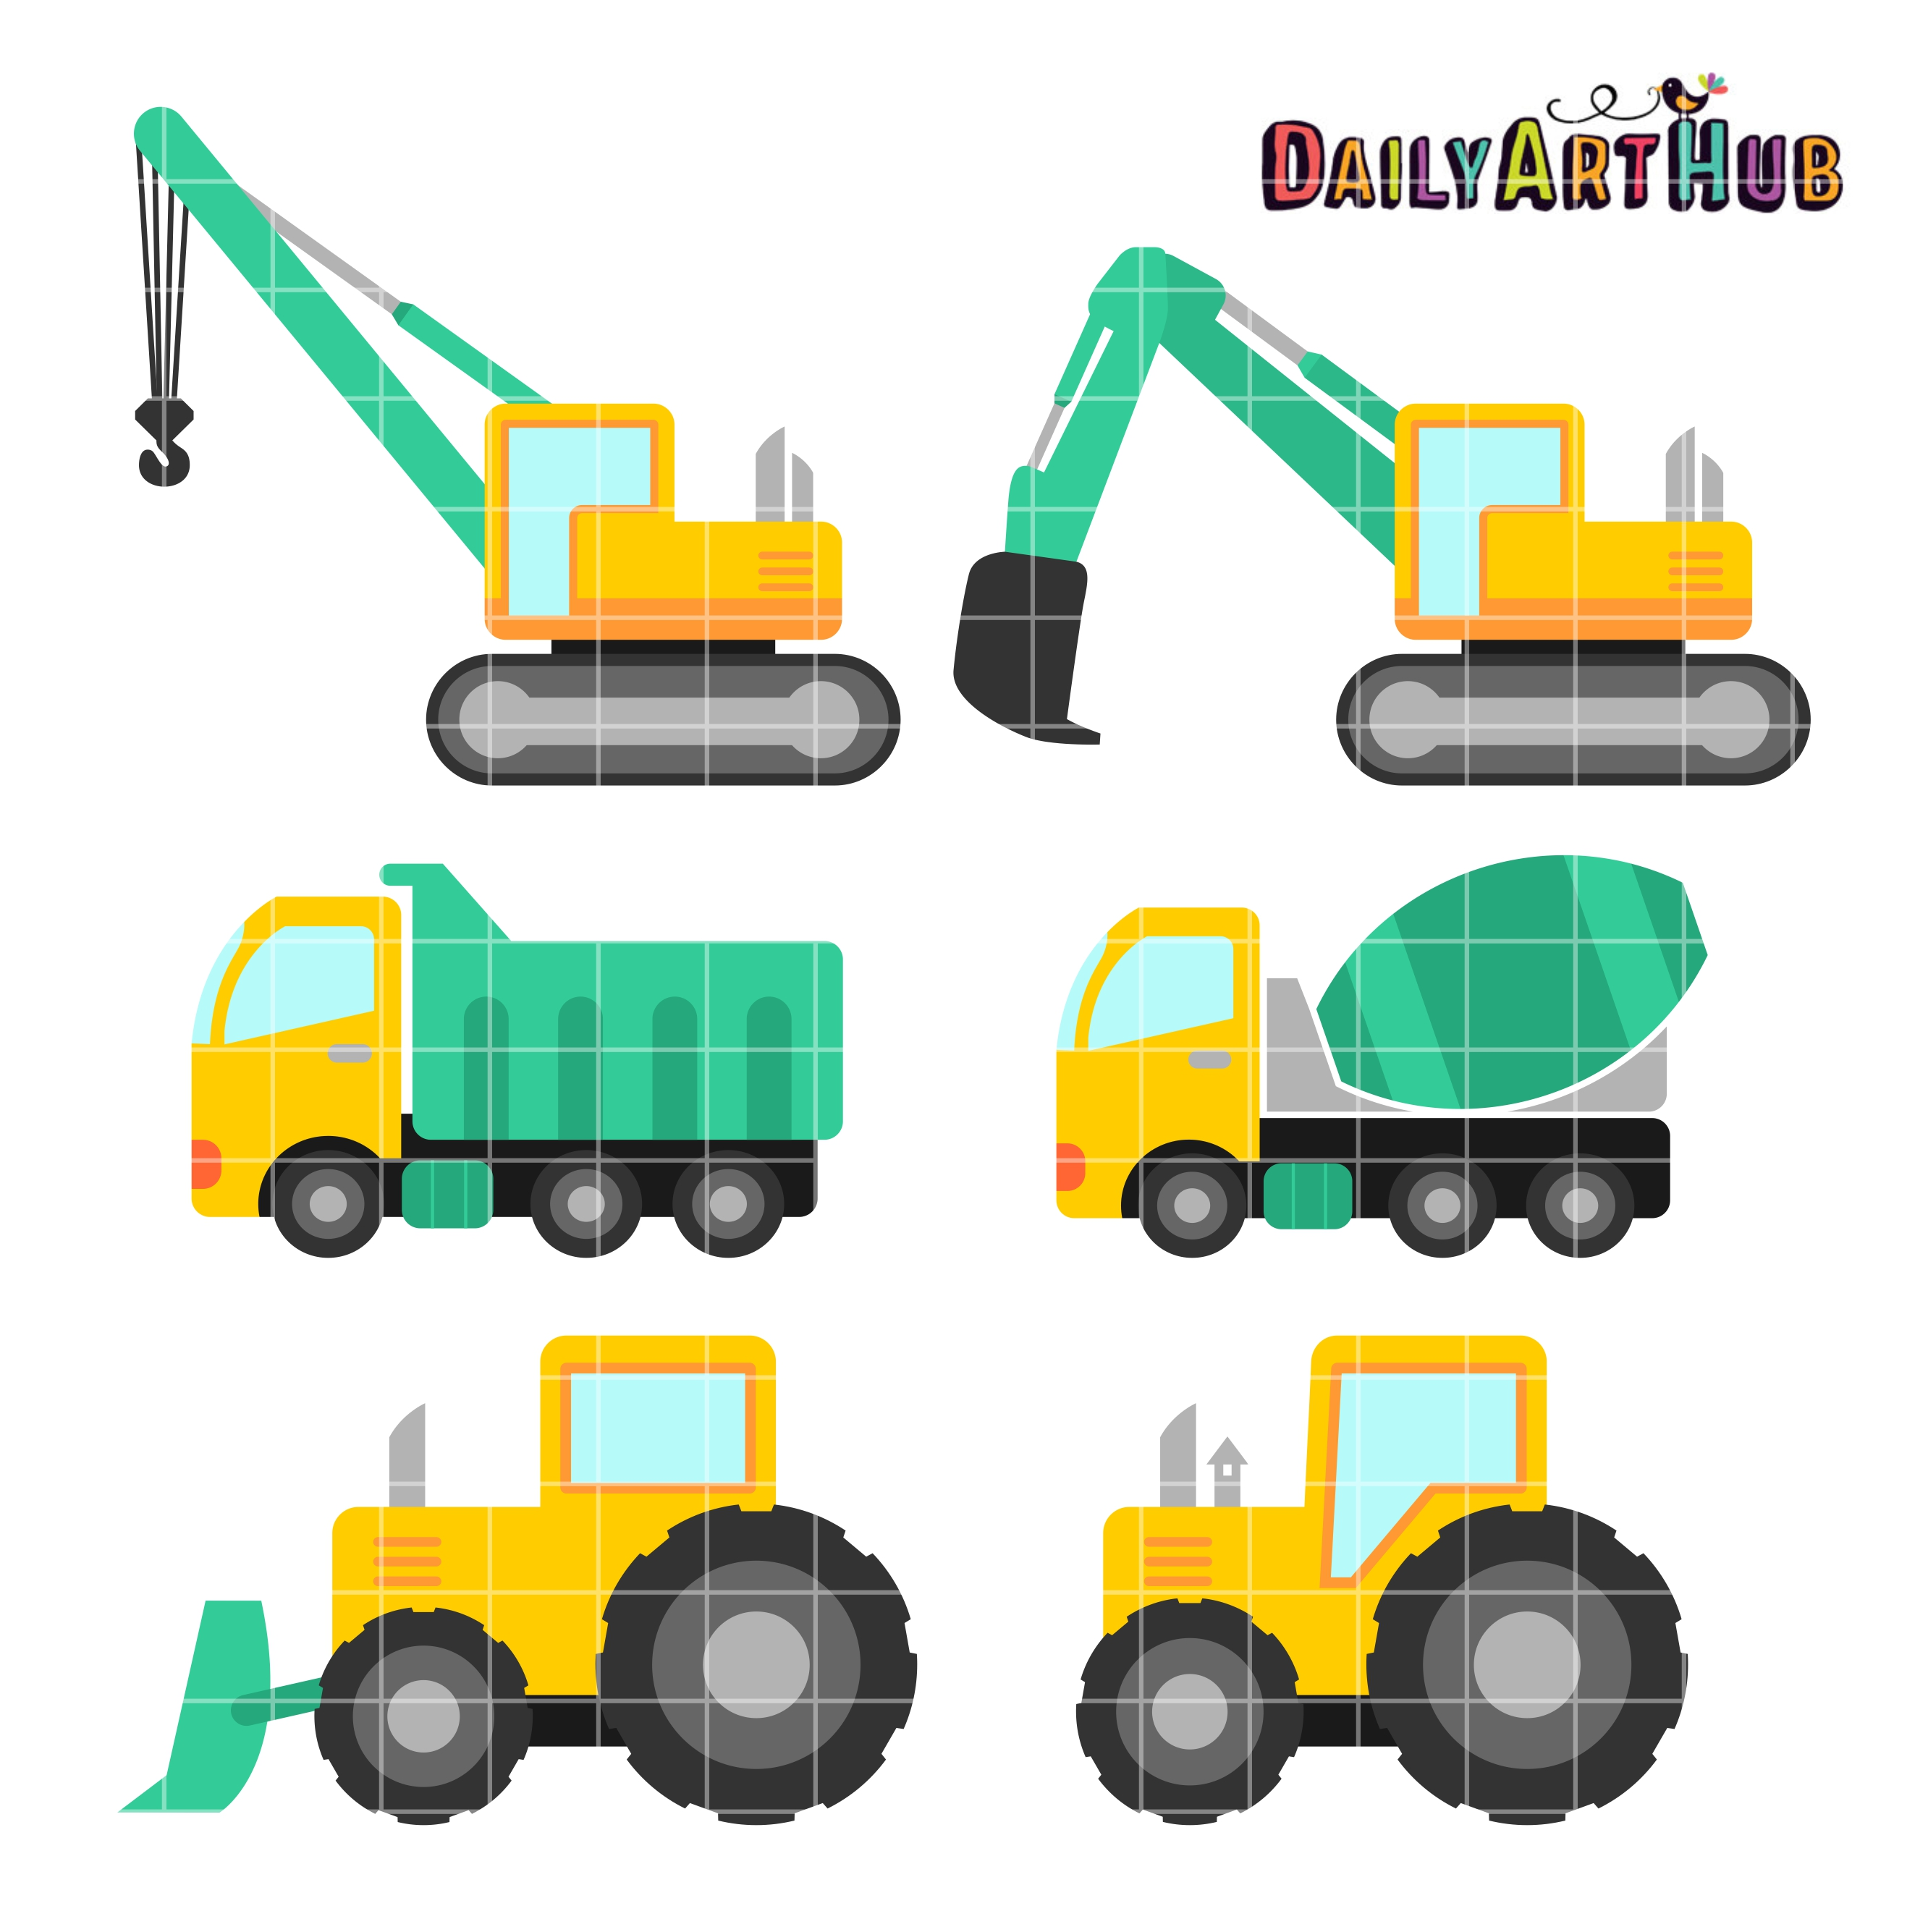 2664x2670 Construction Vehicles Clip Art Set Daily Art Hub Free Clip Art